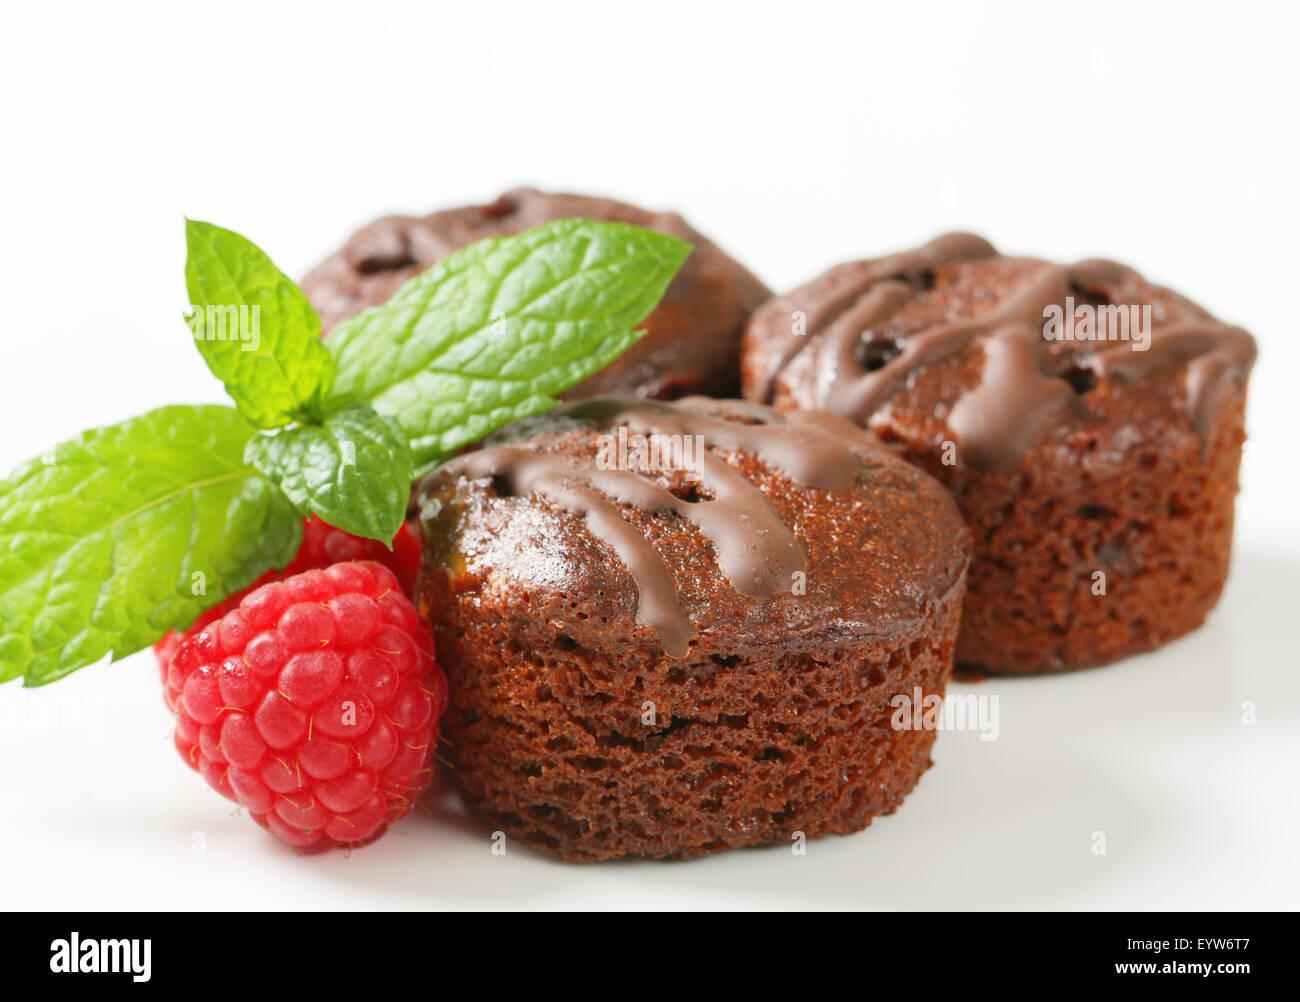 Mini-Schoko-Kuchen mit Himbeer-Füllung Stockbild